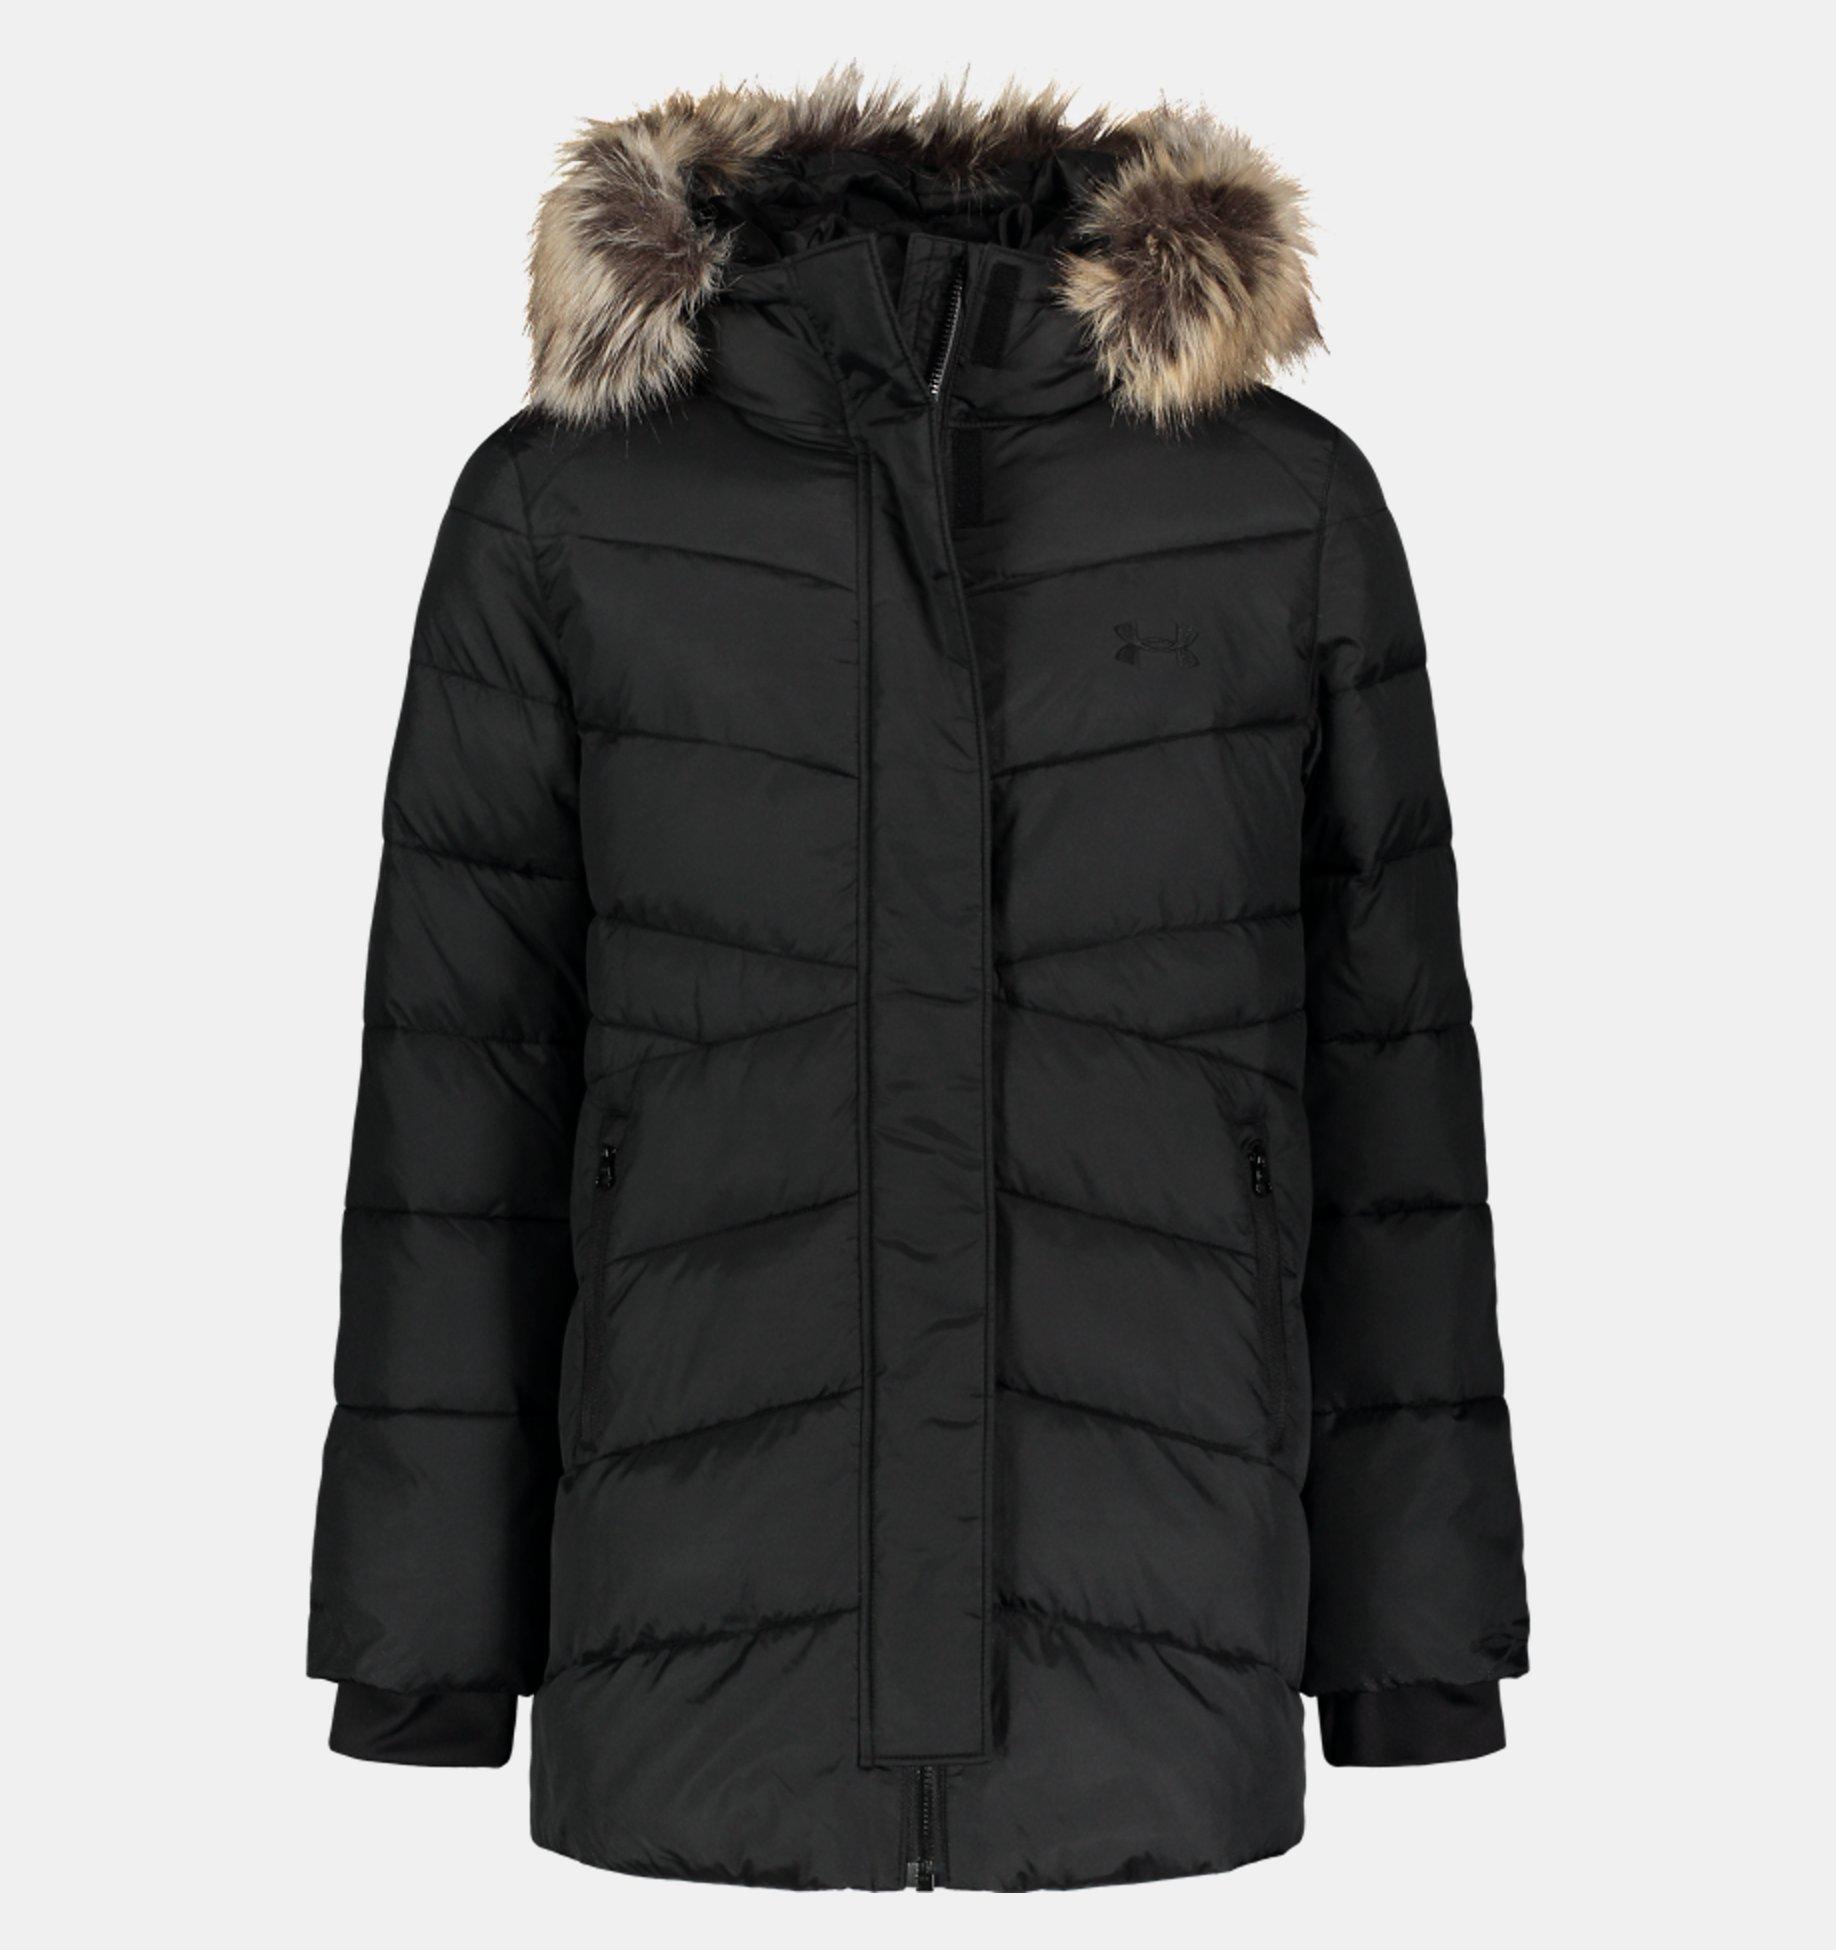 Underarmour Girls Pre-School UA Gigi Parka Puffer Jacket